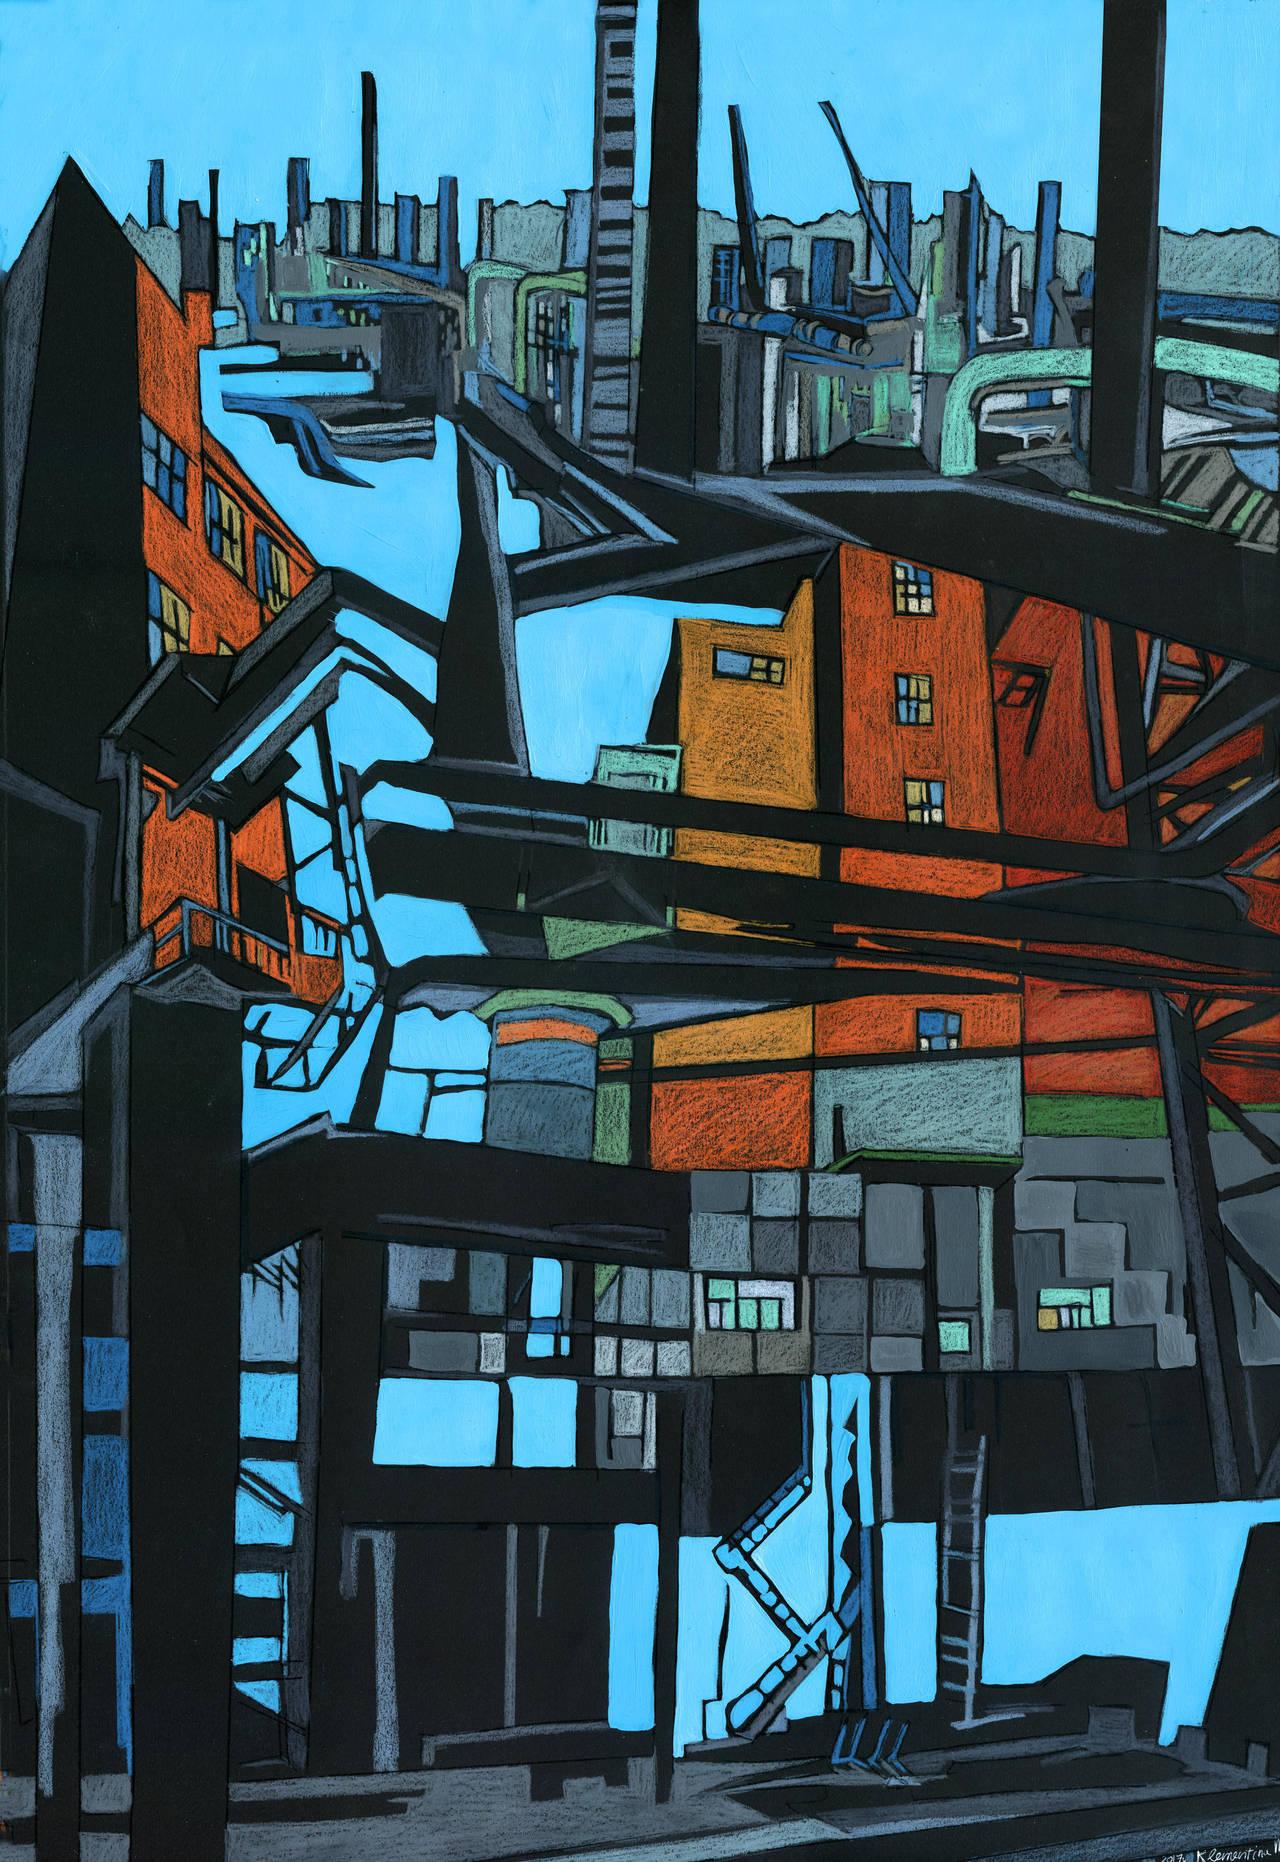 Industrial devastation by KlementinaMoonlight